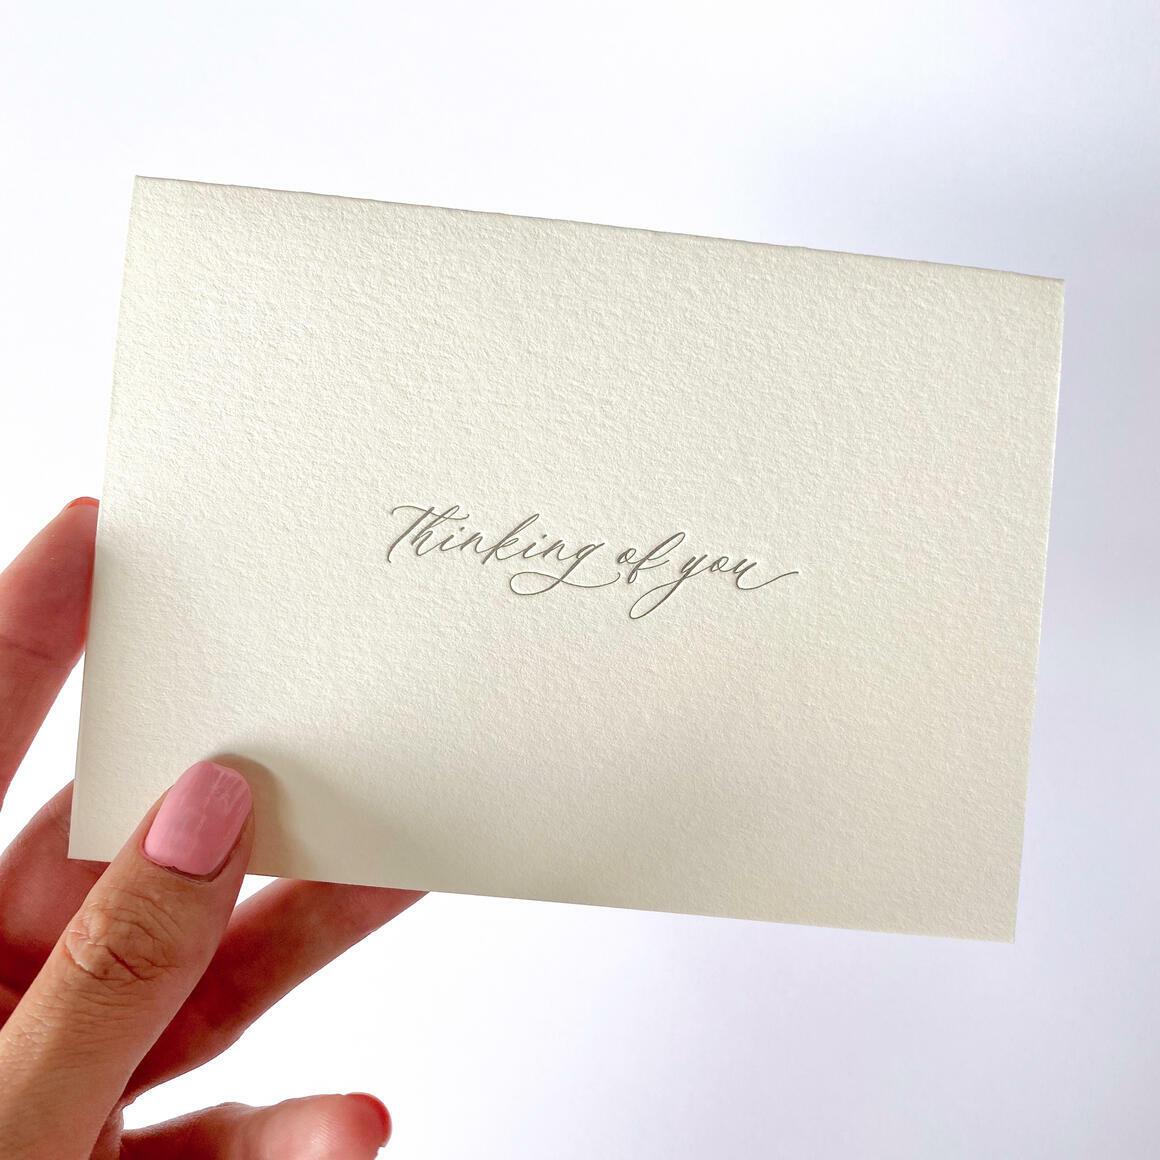 Thinking Of You   Letterpress Greeting Card   Trada Marketplace